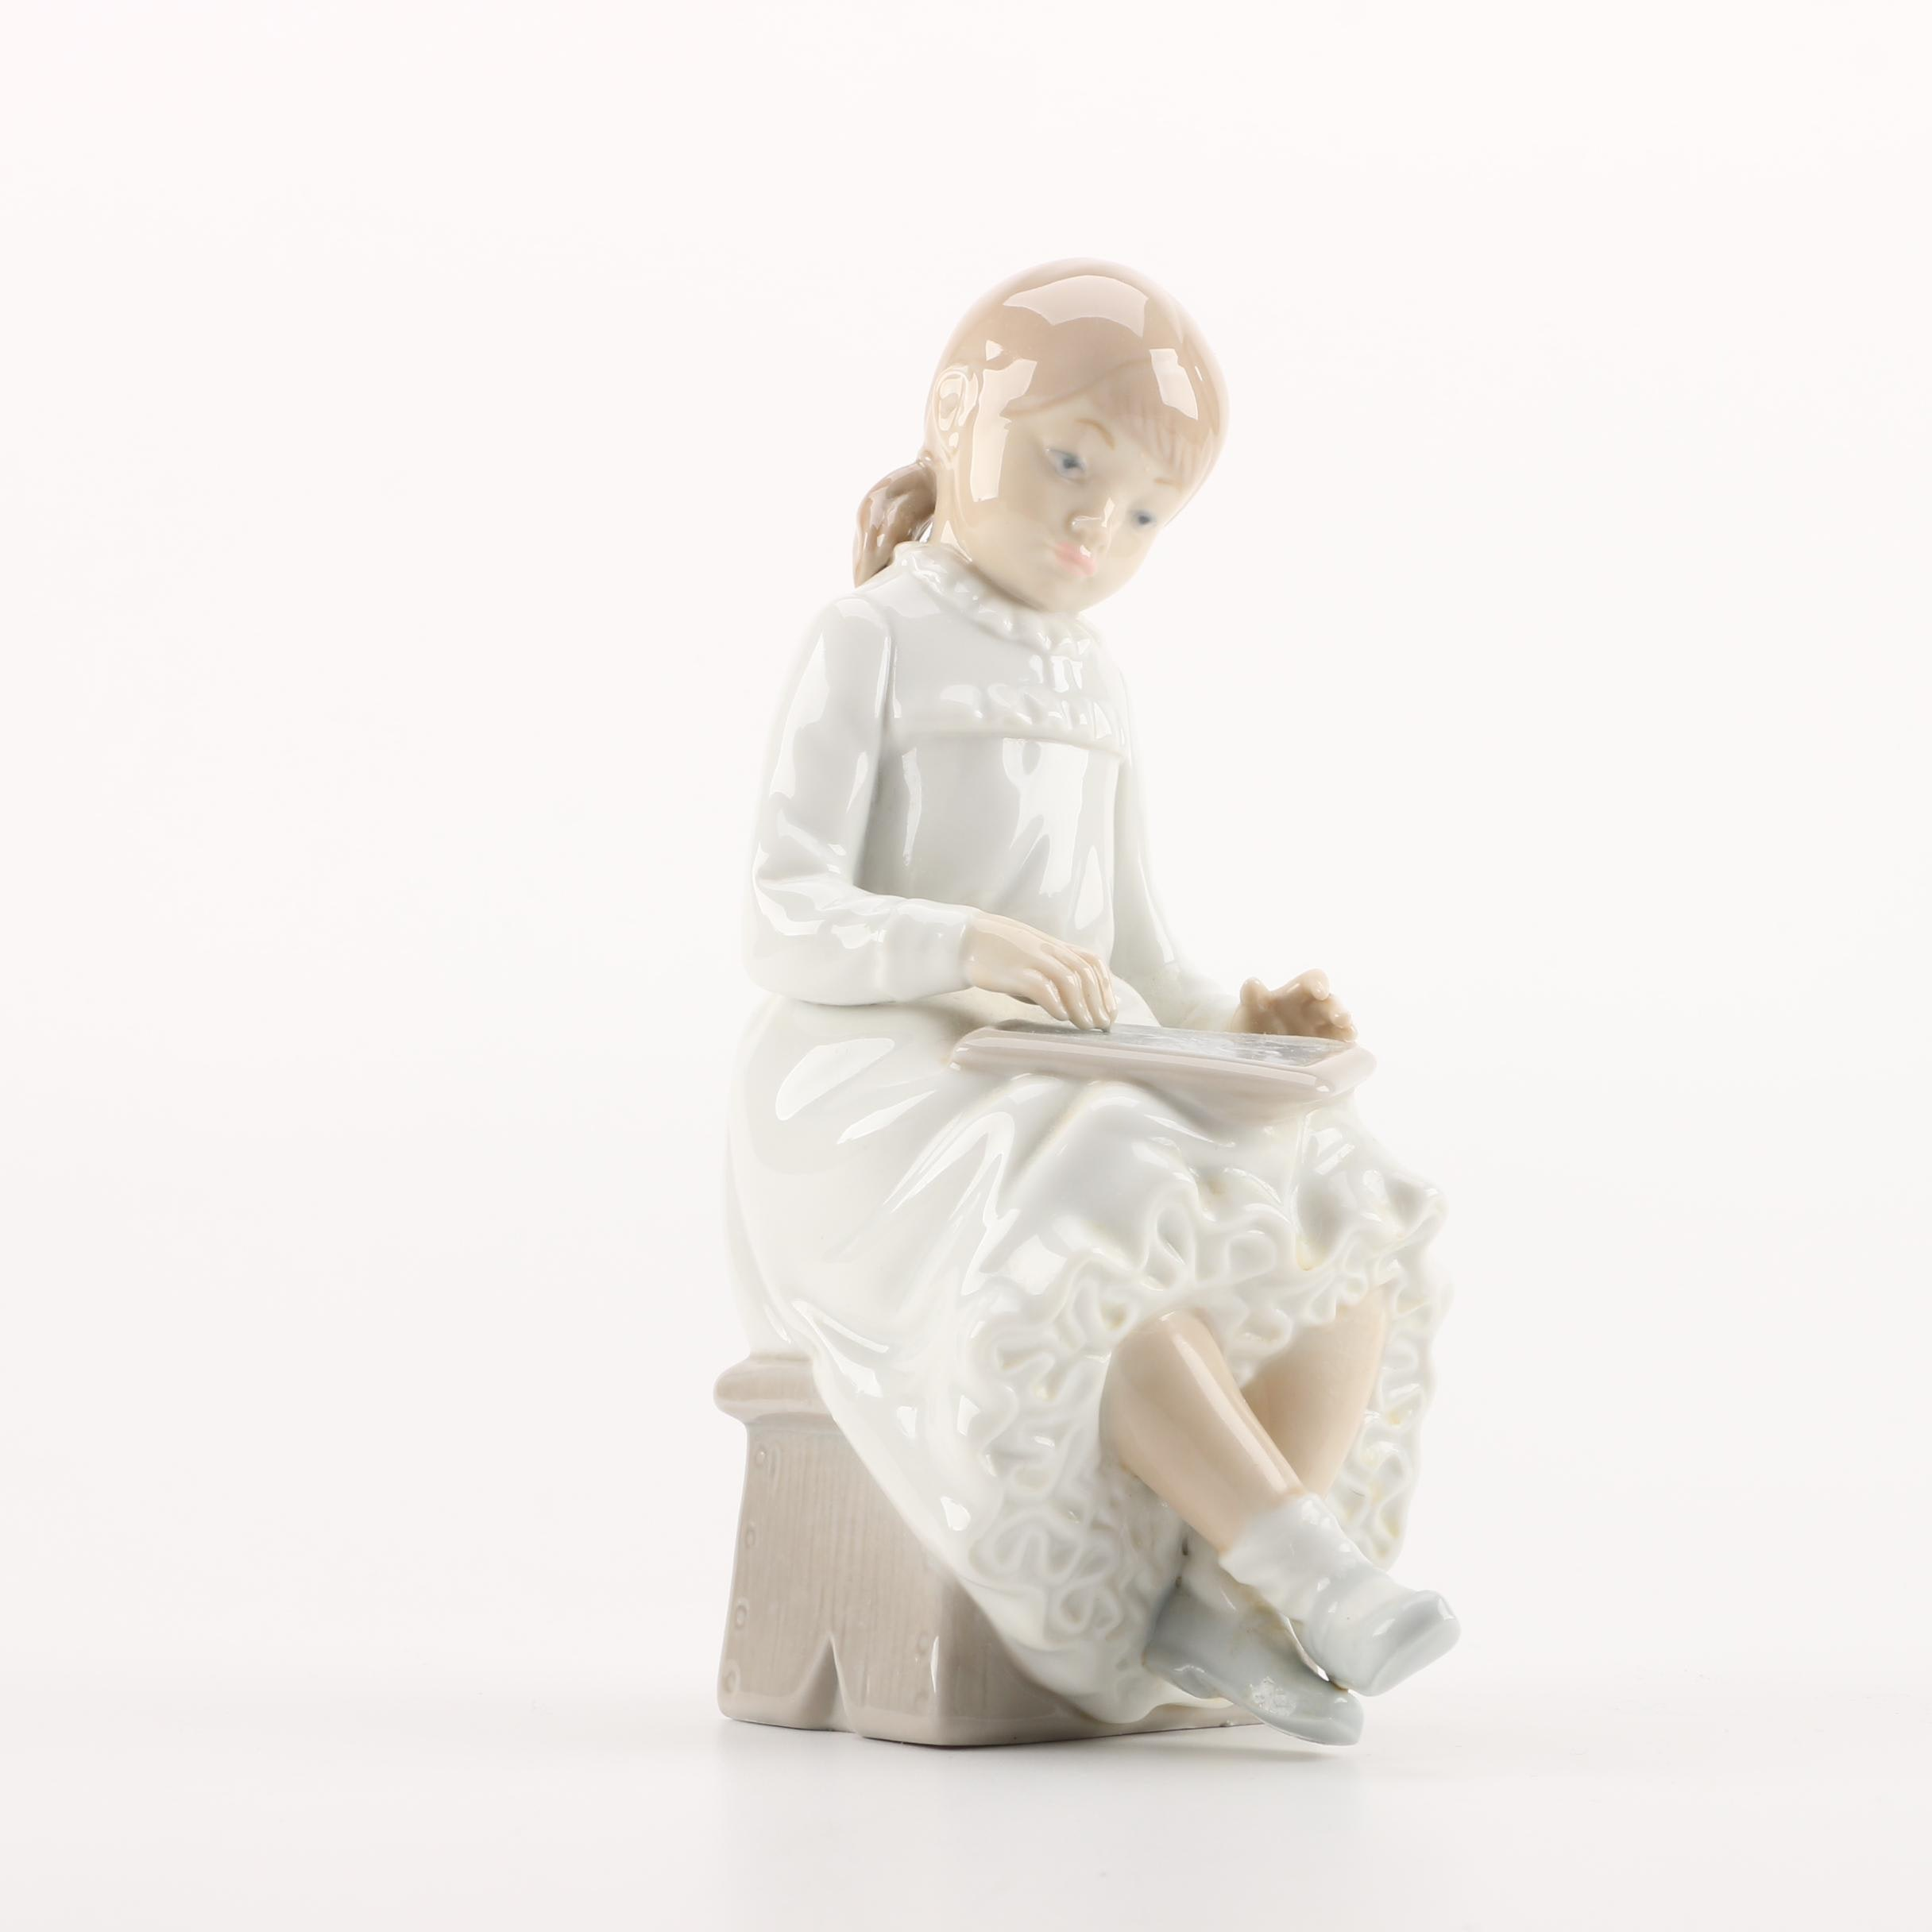 "NAO by Lladró ""Girl Sitting Writing on Chalkboard"" Figurine"